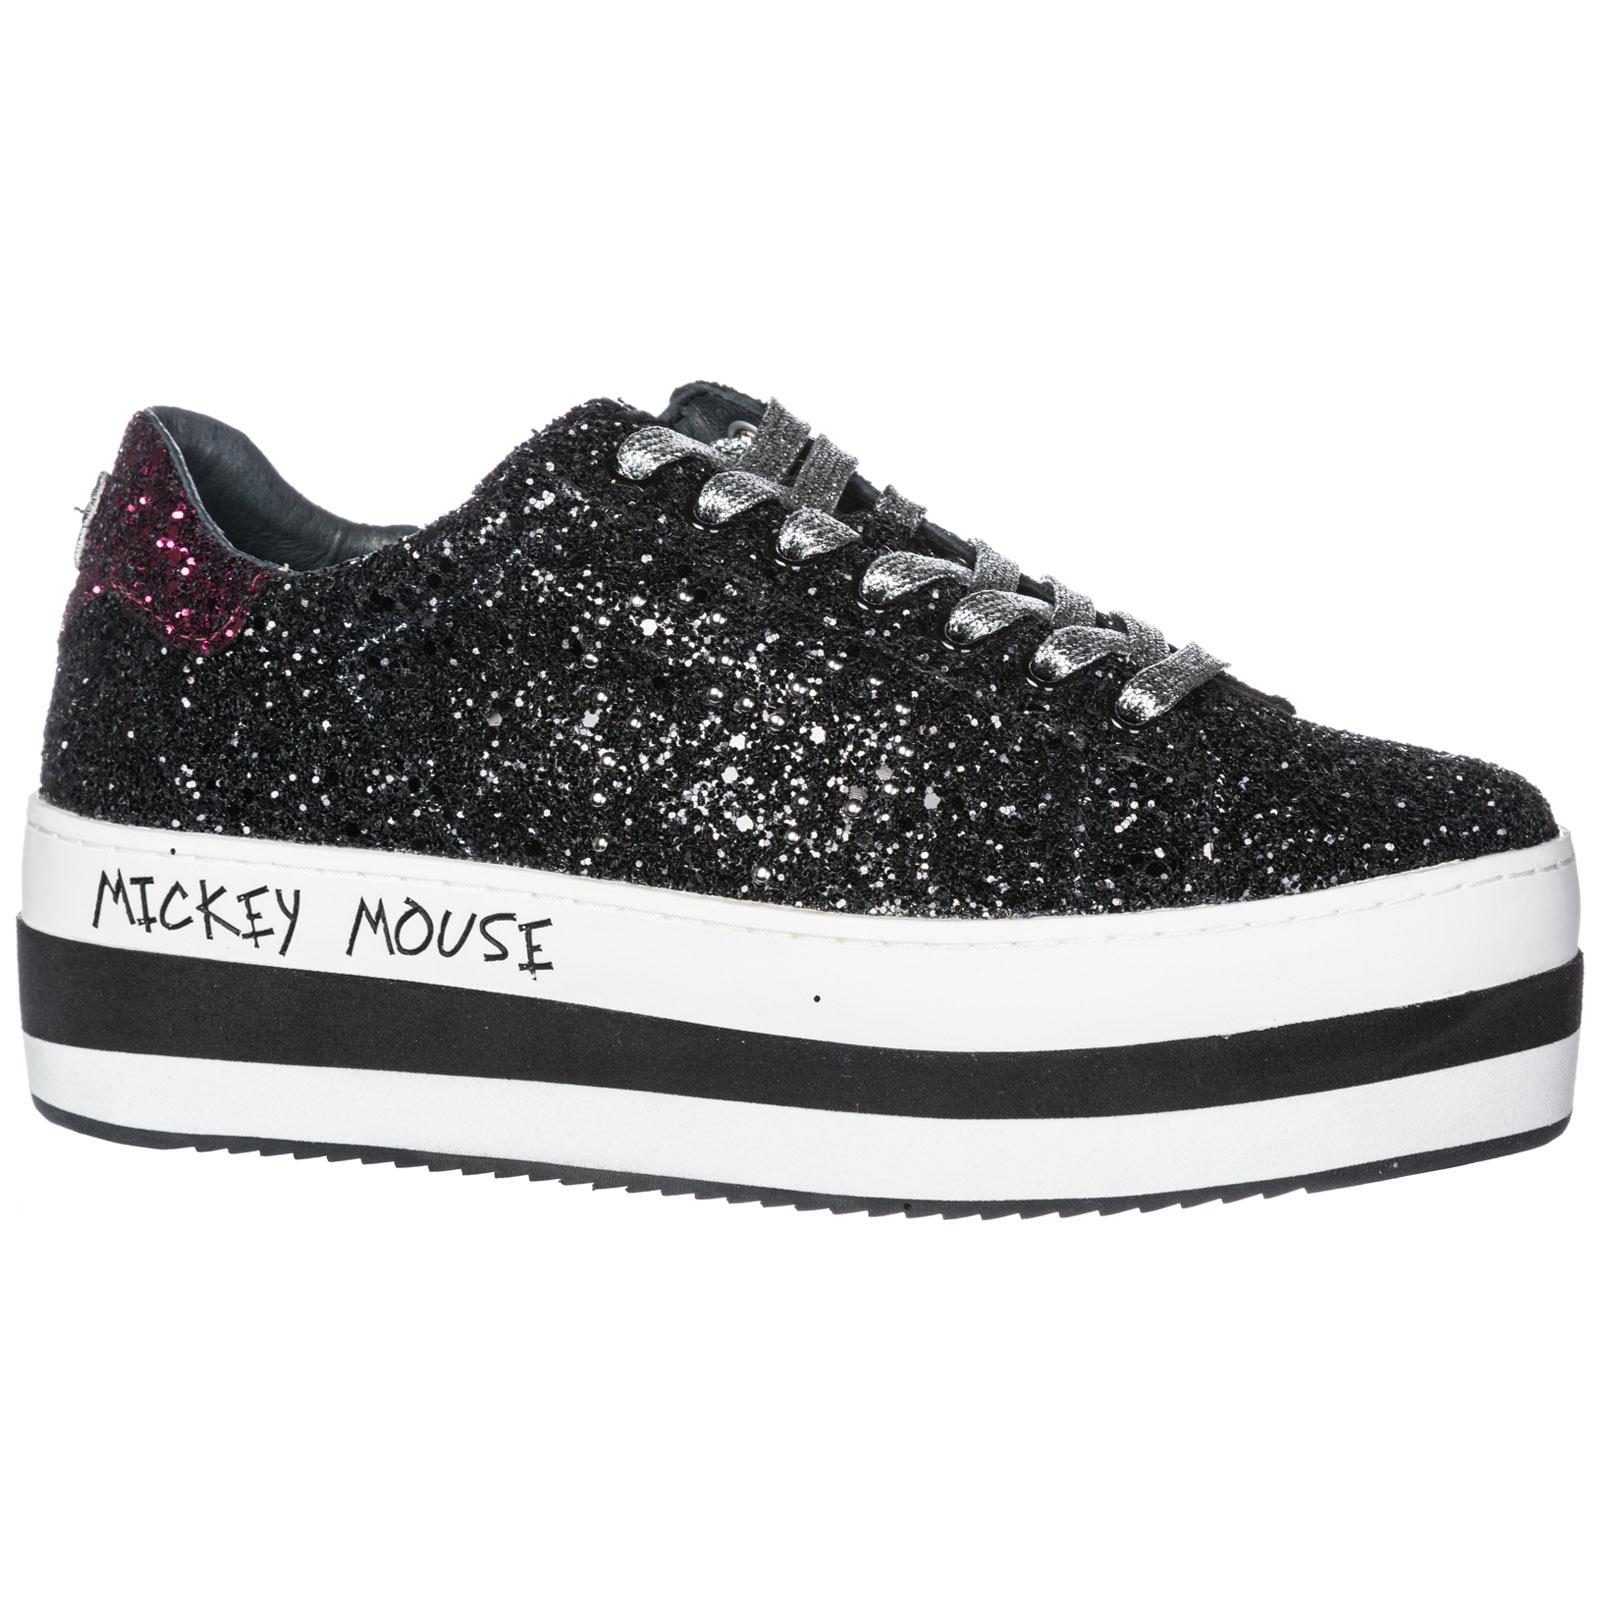 Damenschuhe damen schuhe sneakers turnschuhe disney mickey mouse